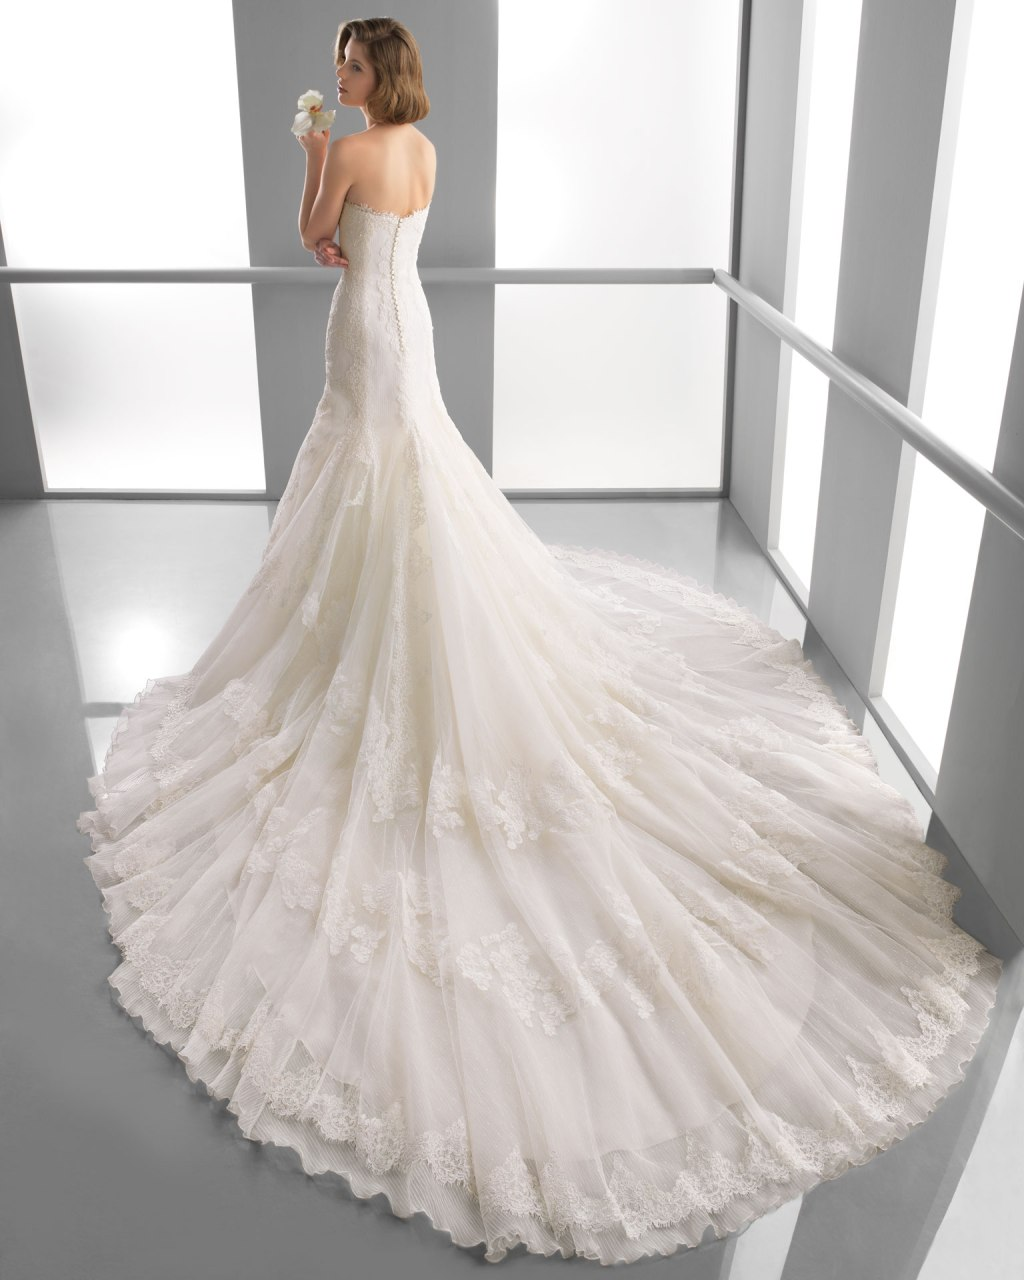 Alma novia 2014 spring bridal collection the fashionbrides for Alma novia wedding dress